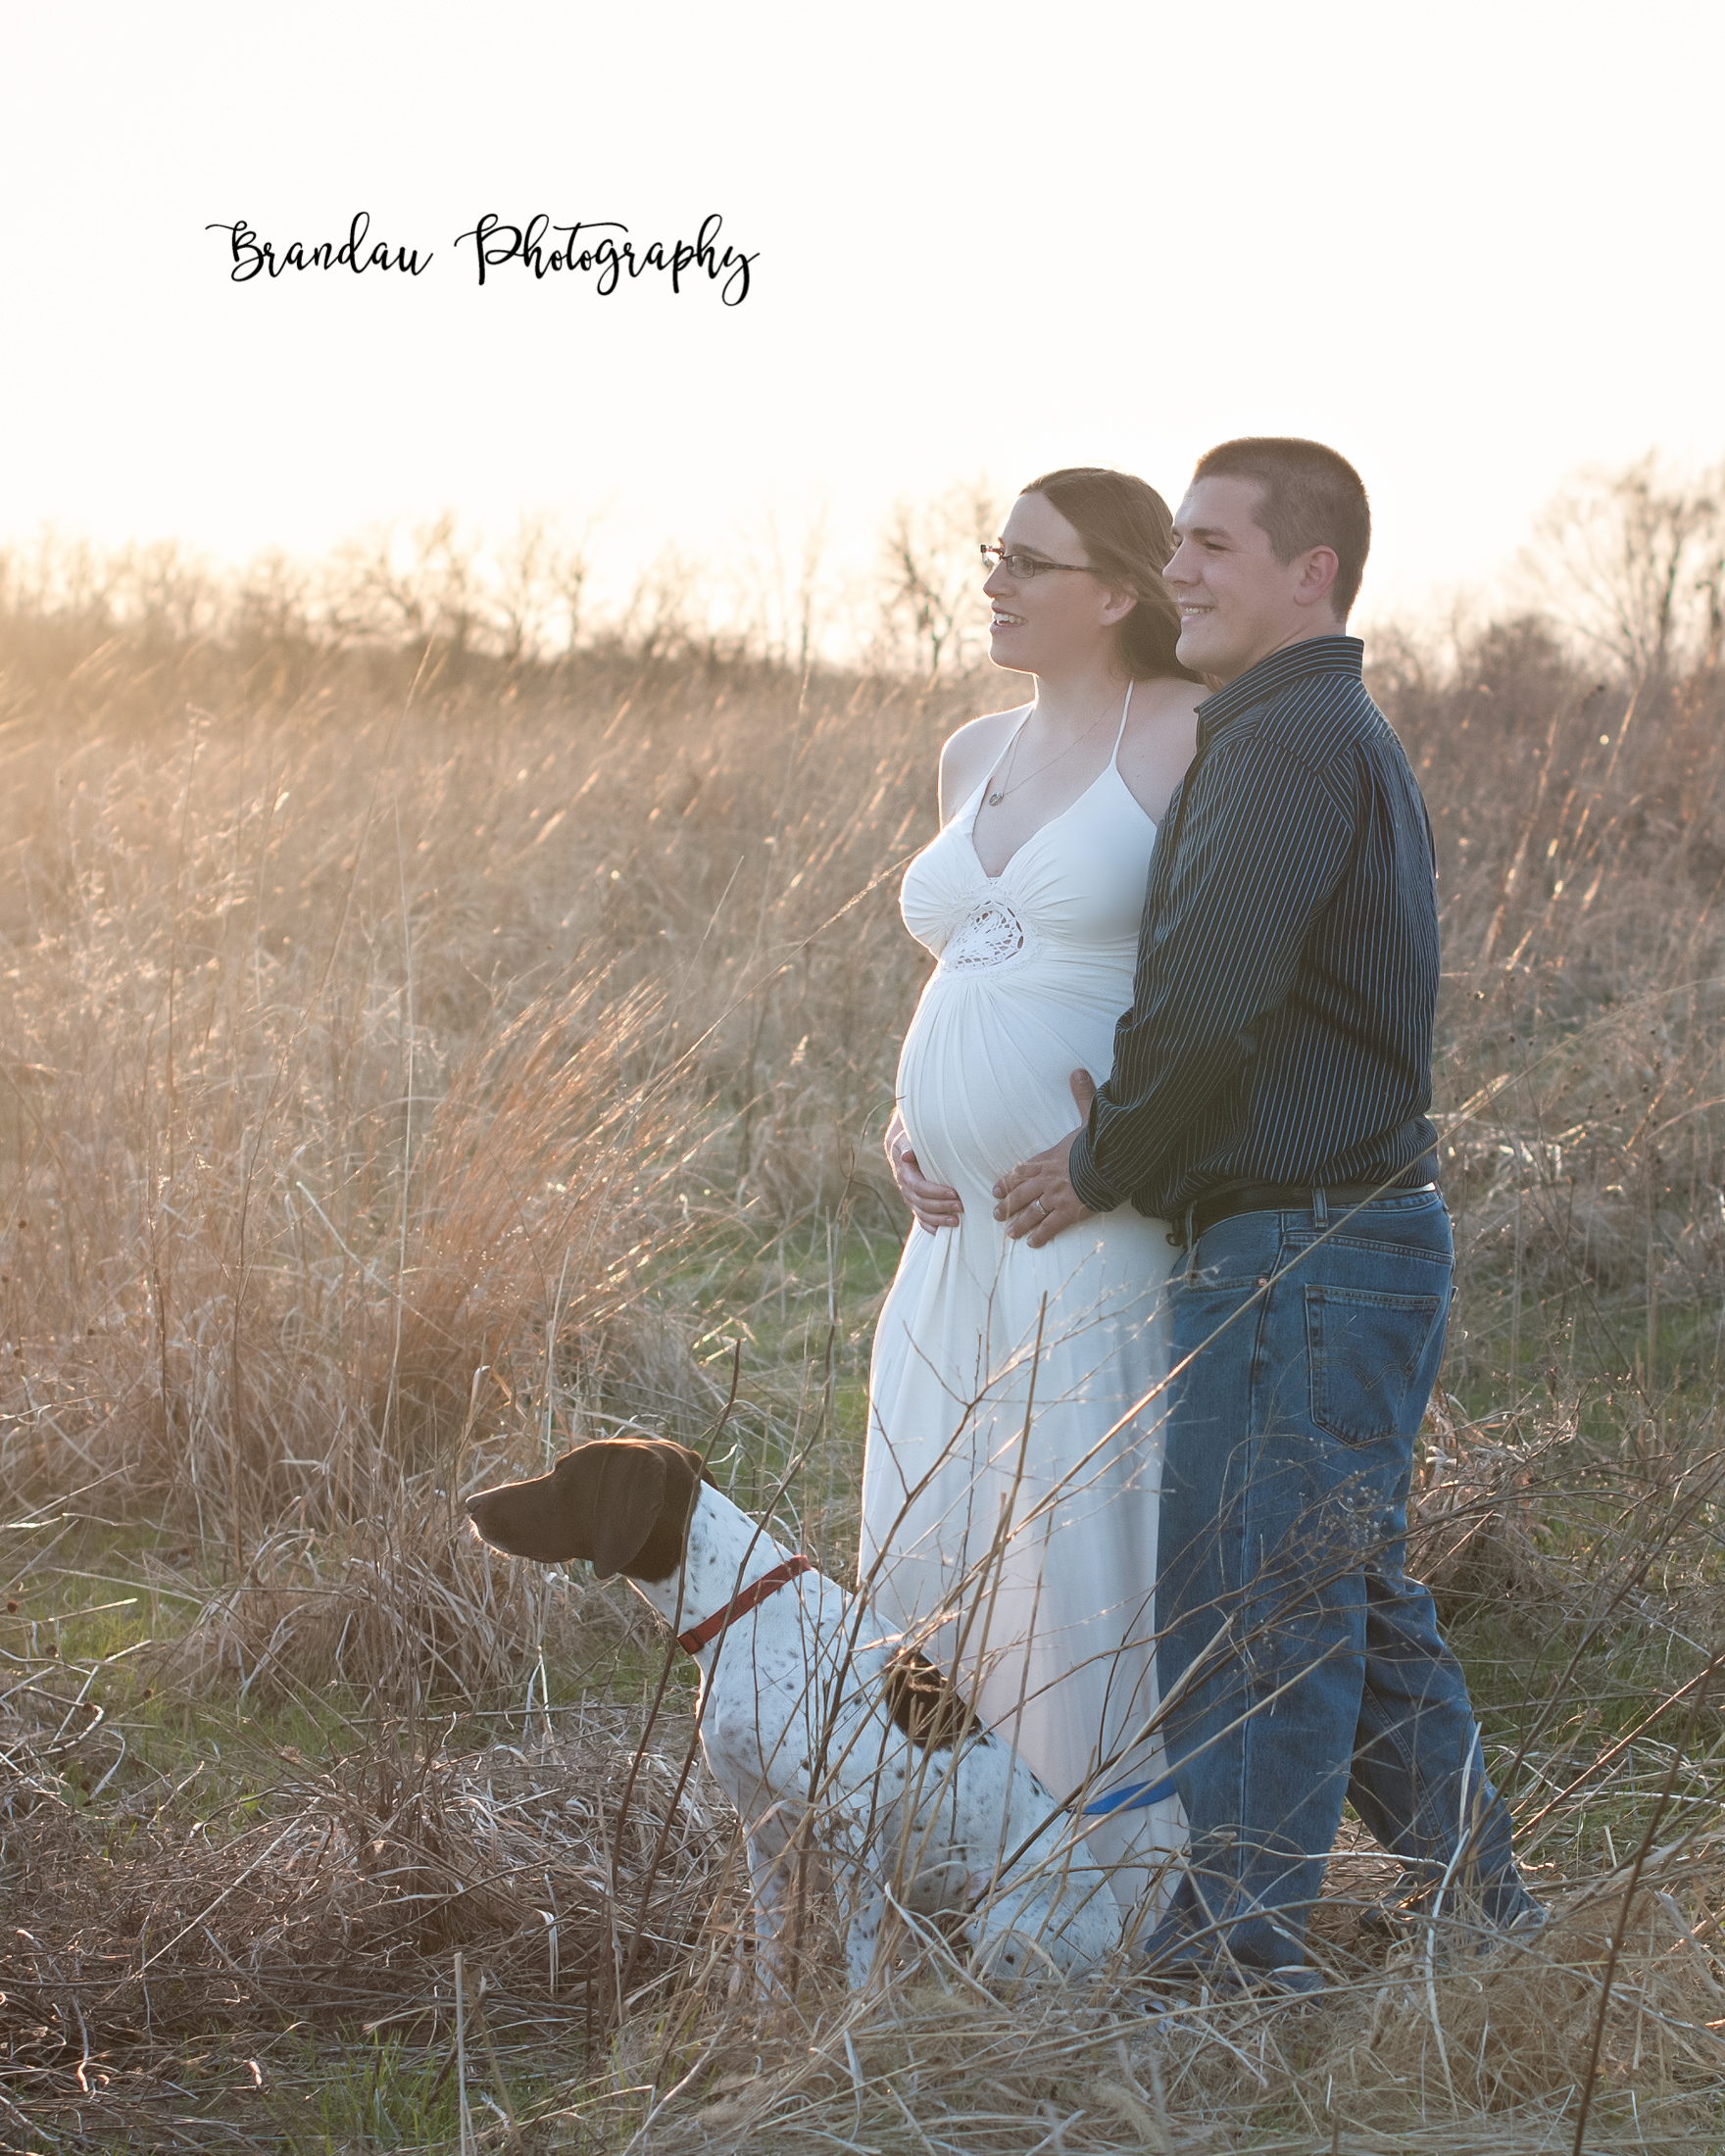 Brandau Photography - Central Iowa Maternity - Ames Iowa